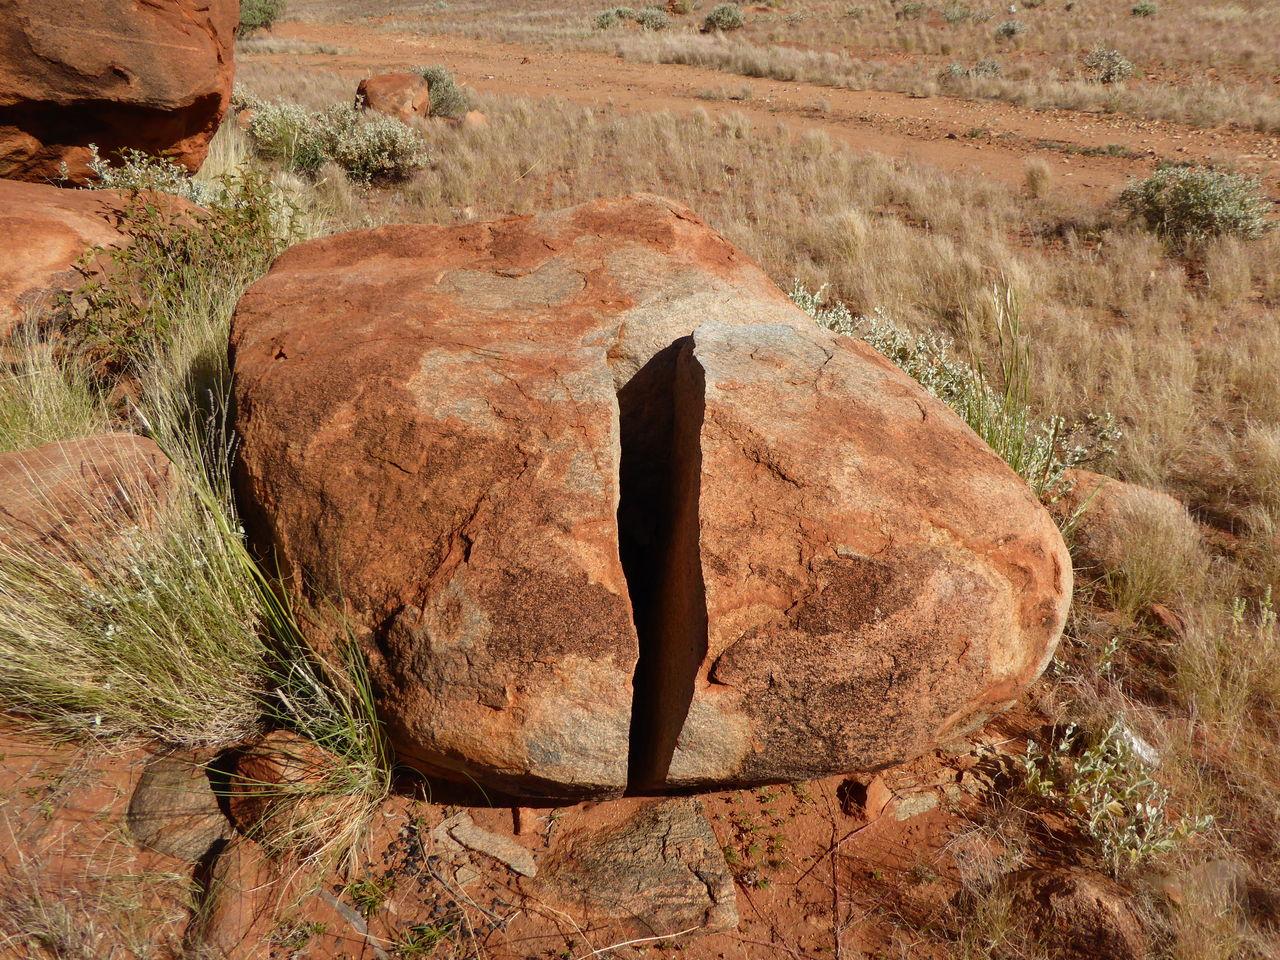 Australian Outback Clean Crack! Cracked Boulder Desert Frost Frost Cracked Rocks Geology Large Red Coloured Rocks Nature Rock - Object